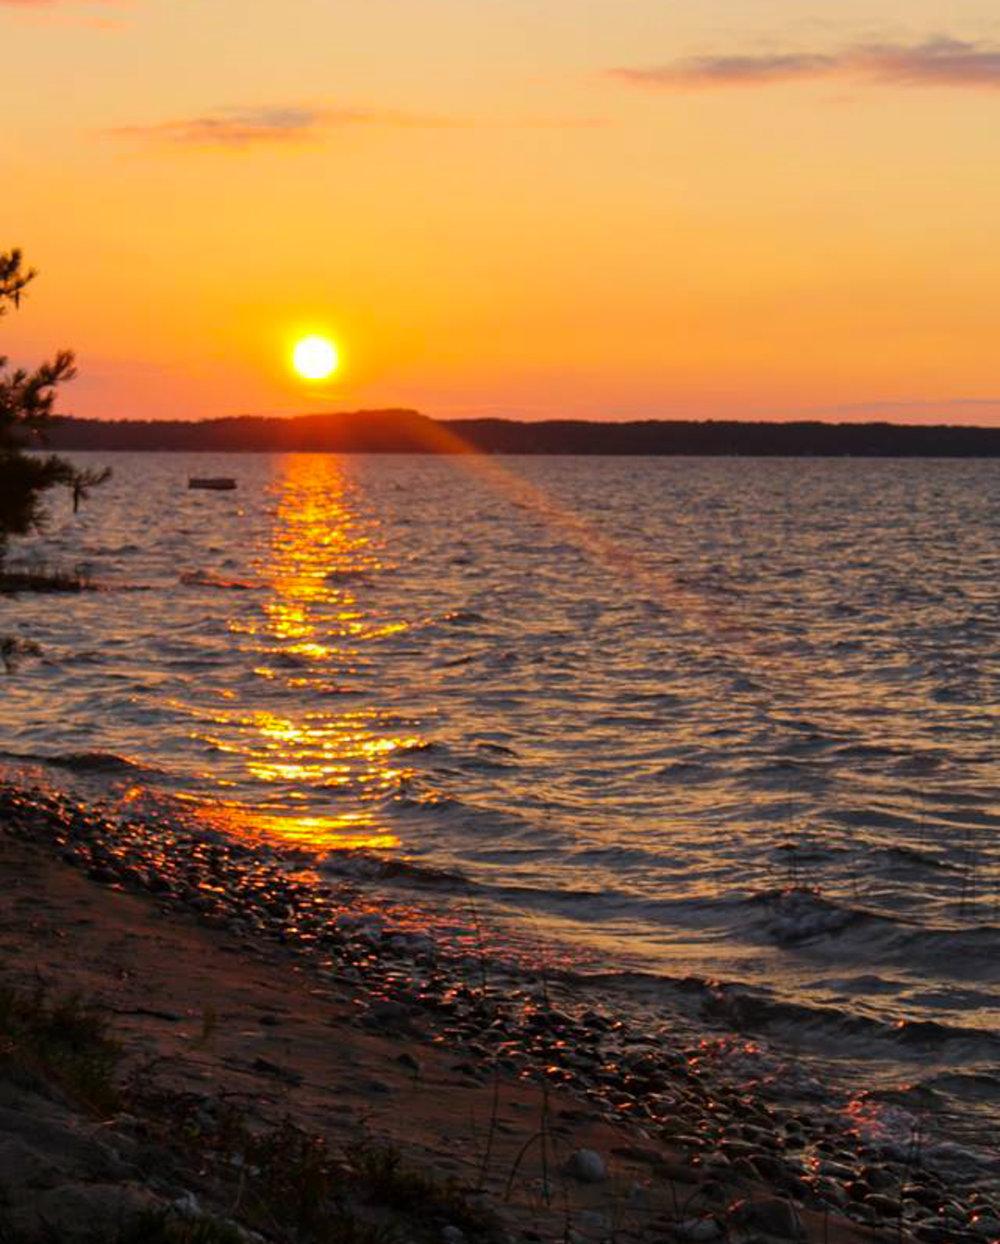 Sunset views over Crystal Lake